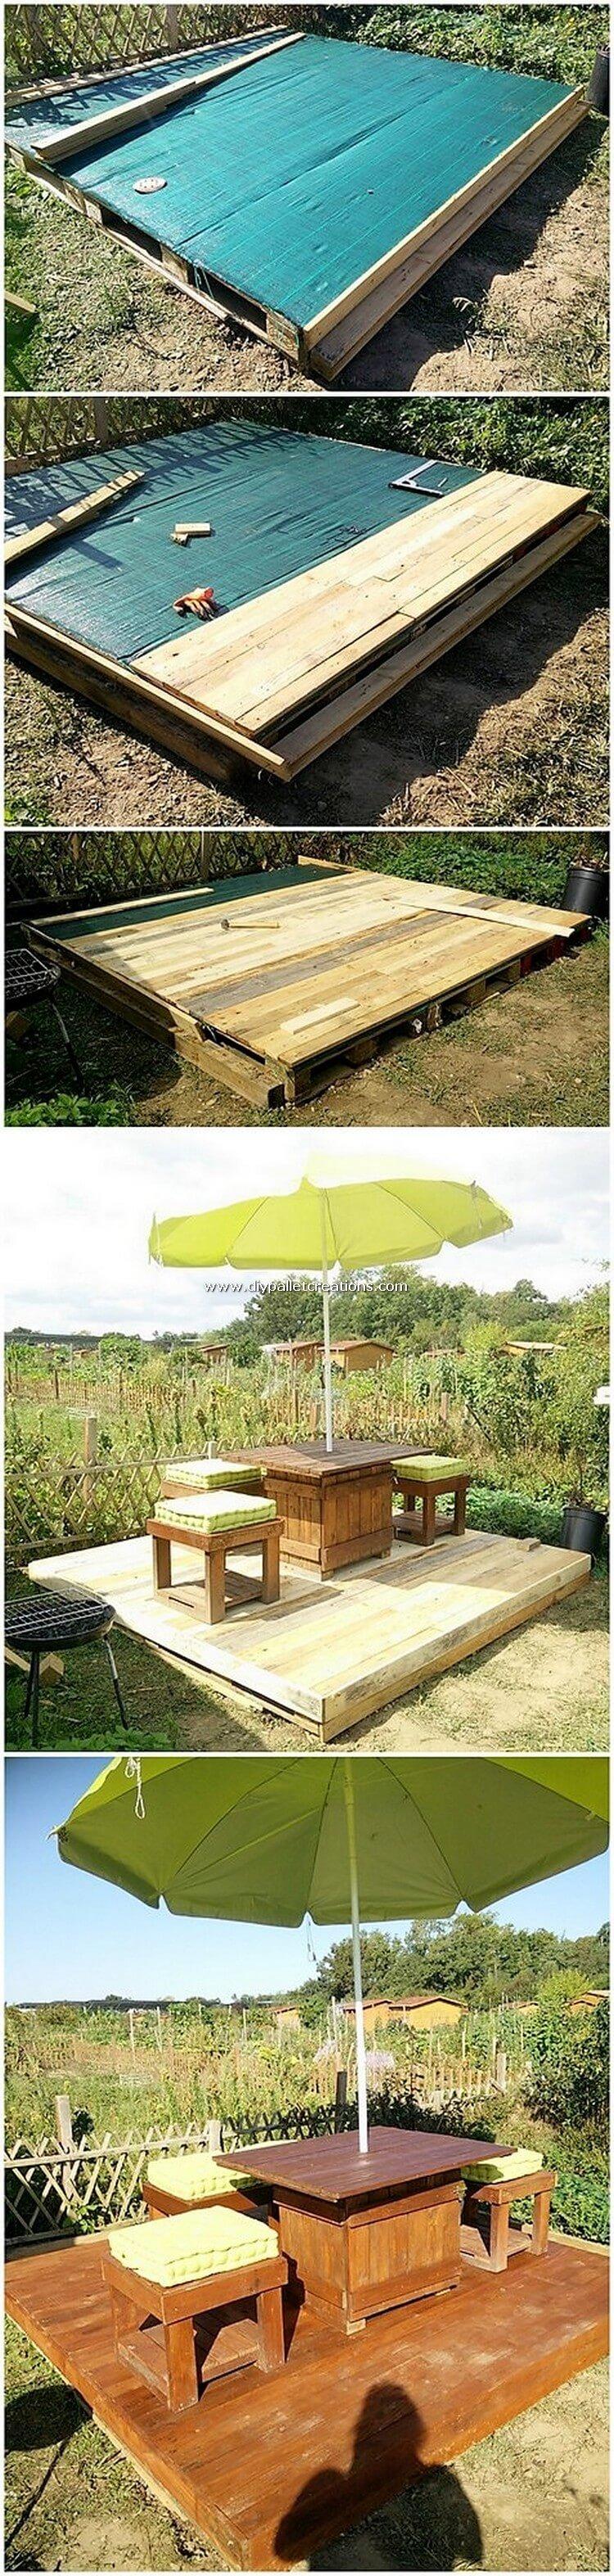 DIY Pallet Garden Terrace with Furniture Set